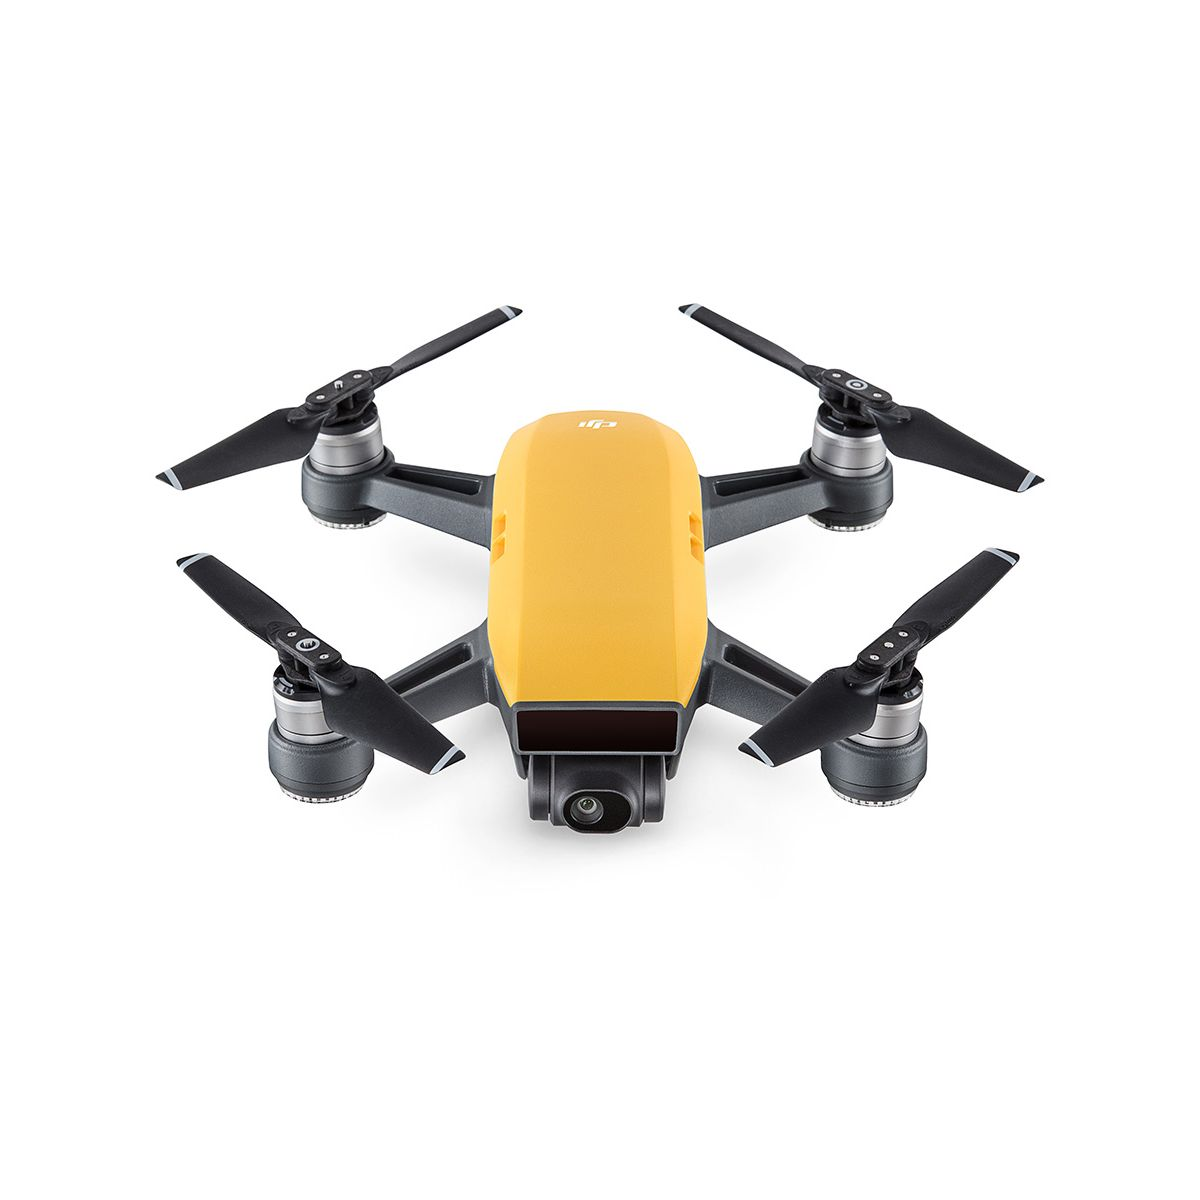 Drone DJI Spark Jaune